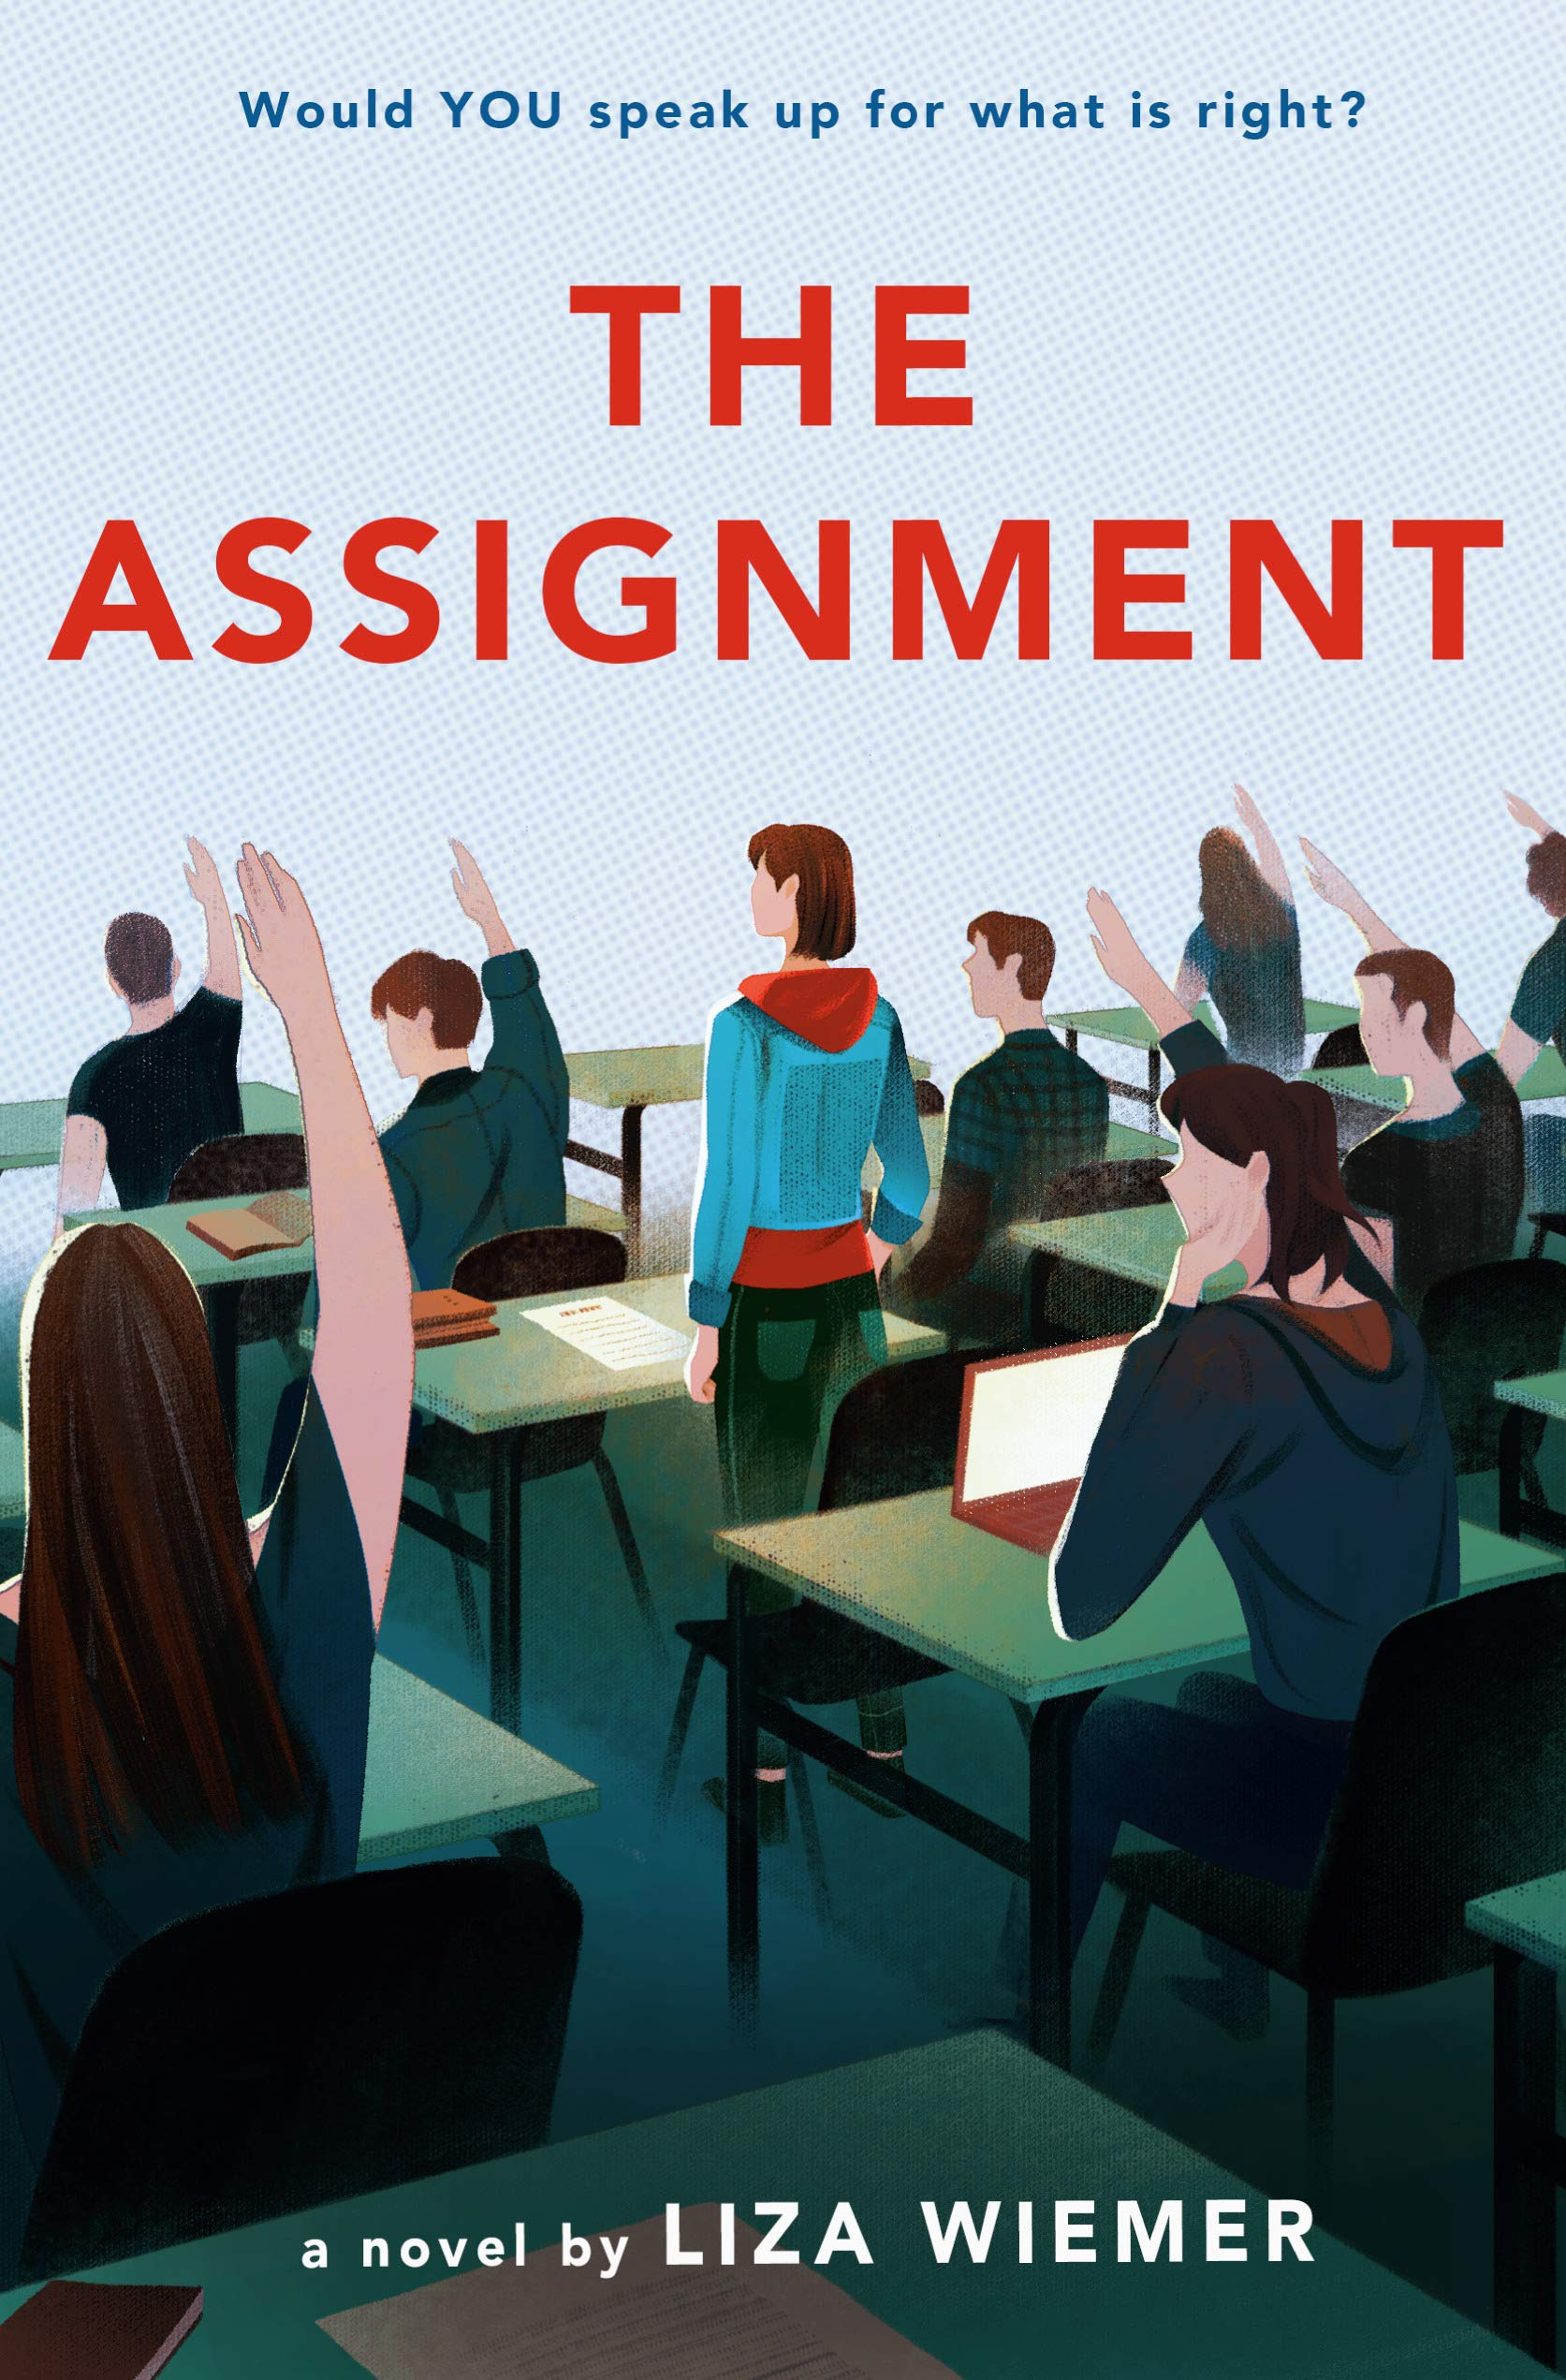 Amazon.com: The Assignment (9780593123164): Wiemer, Liza: Books